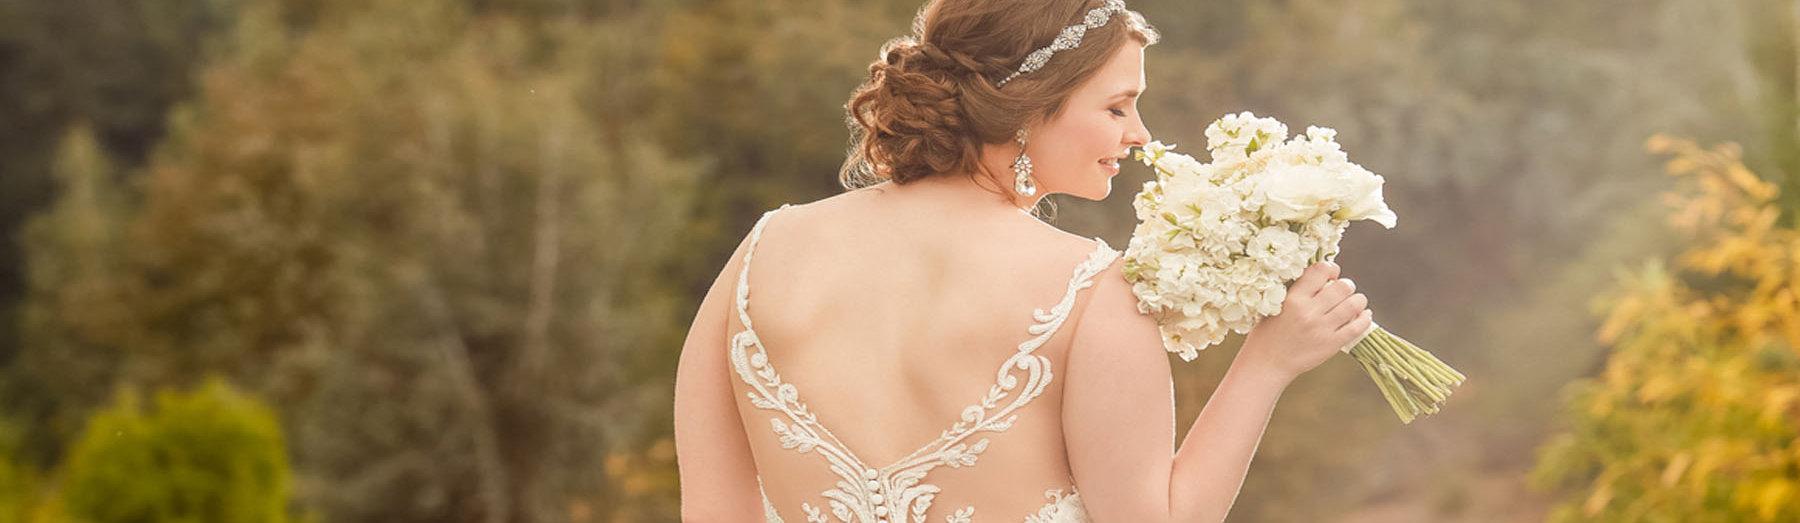 Plus size weddin dresses